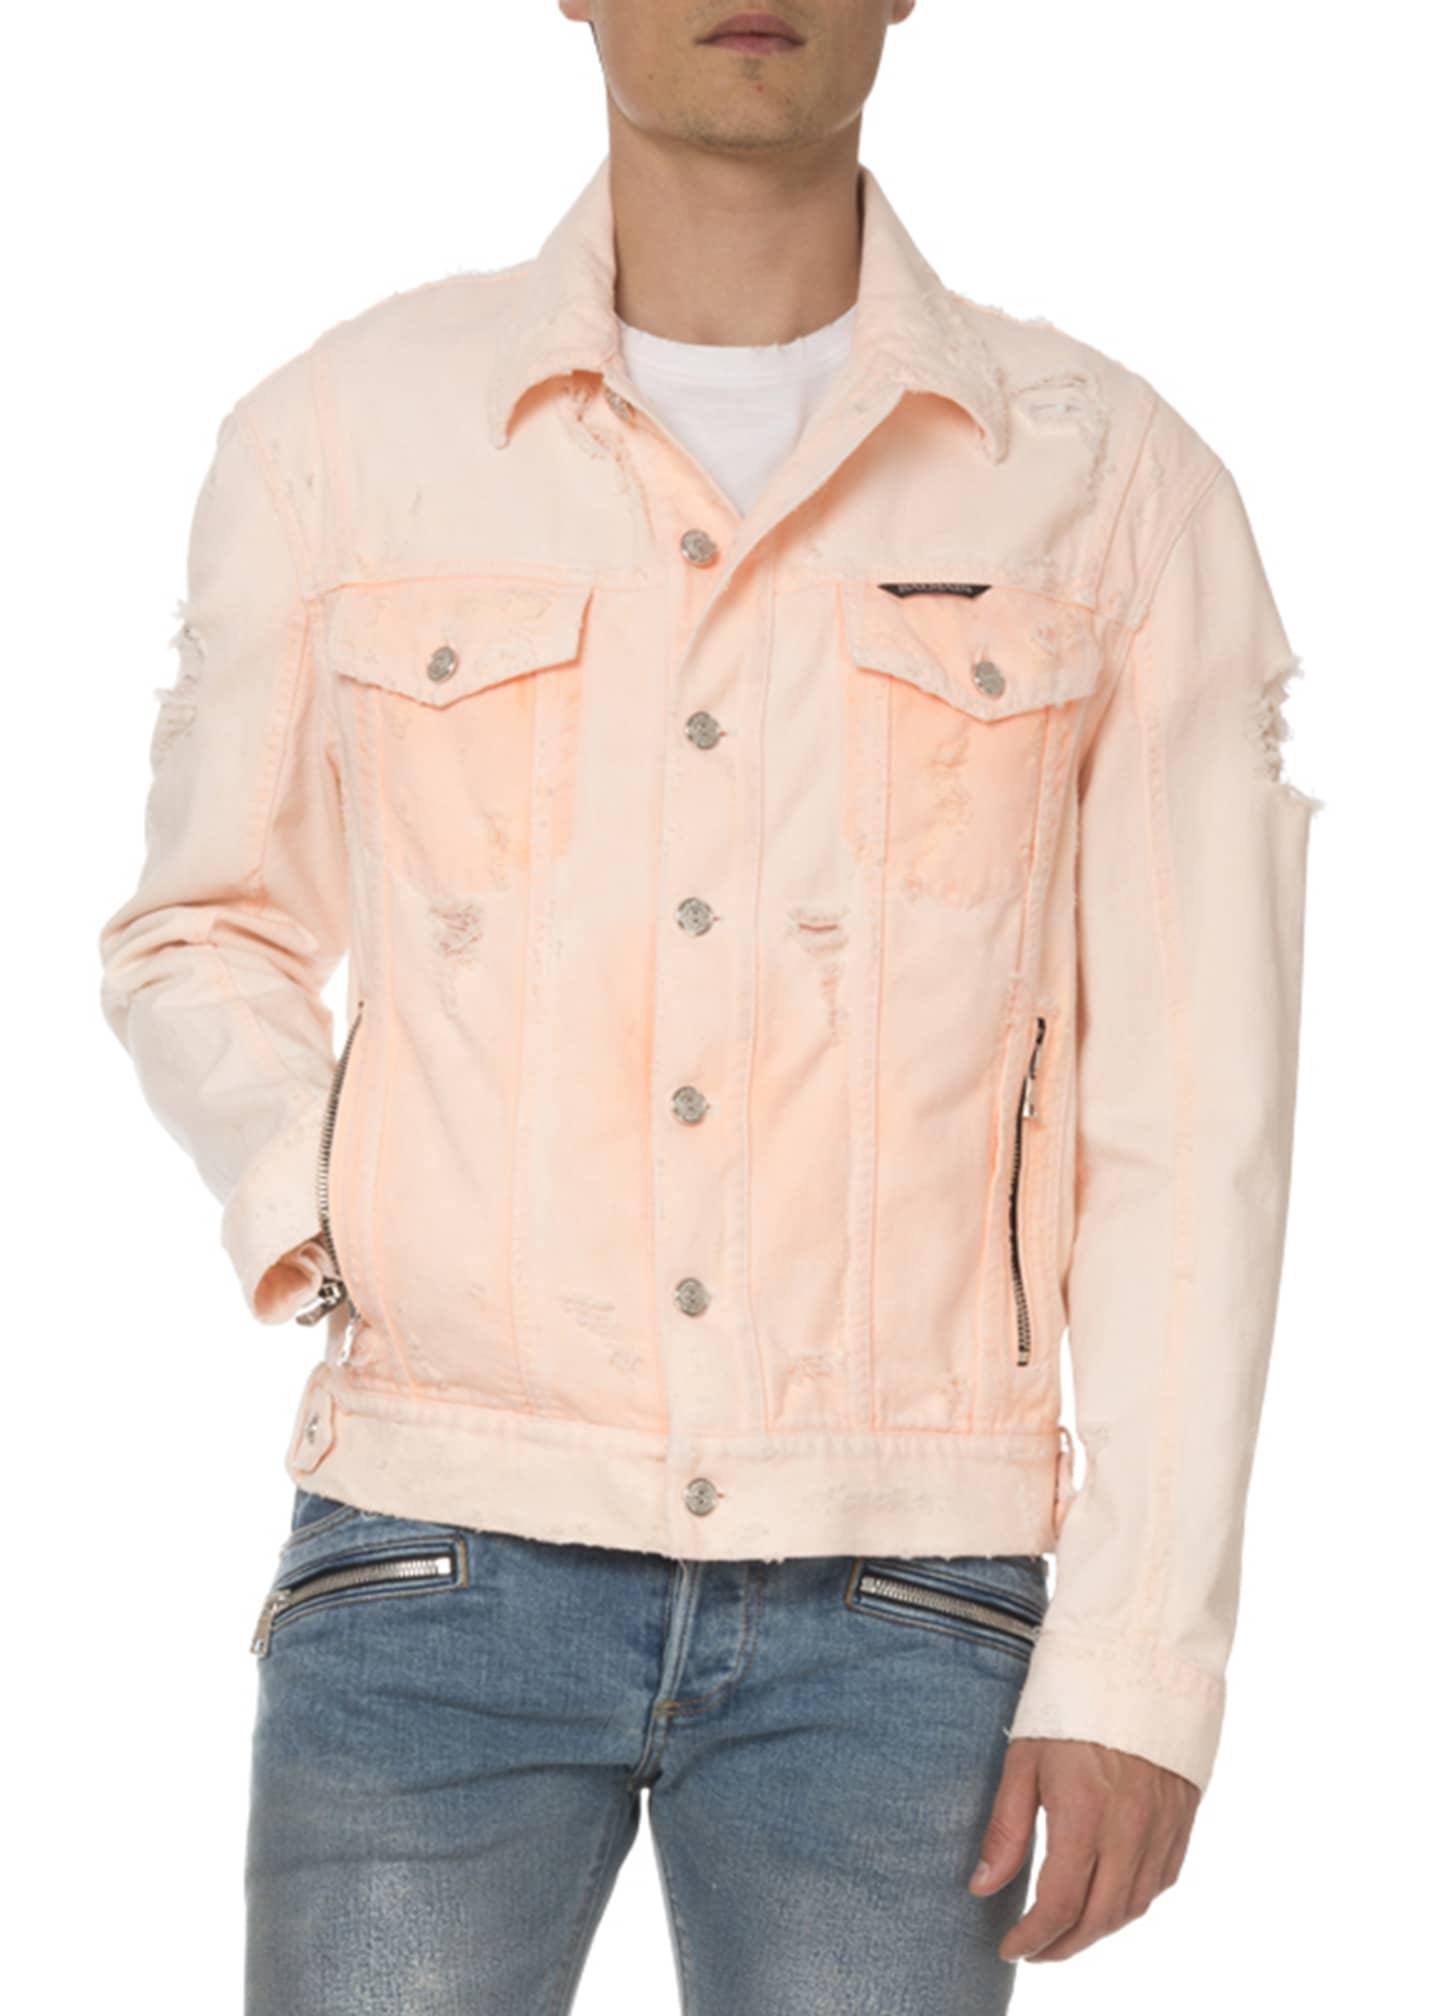 Balmain Men's Distressed Neon Denim Jacket